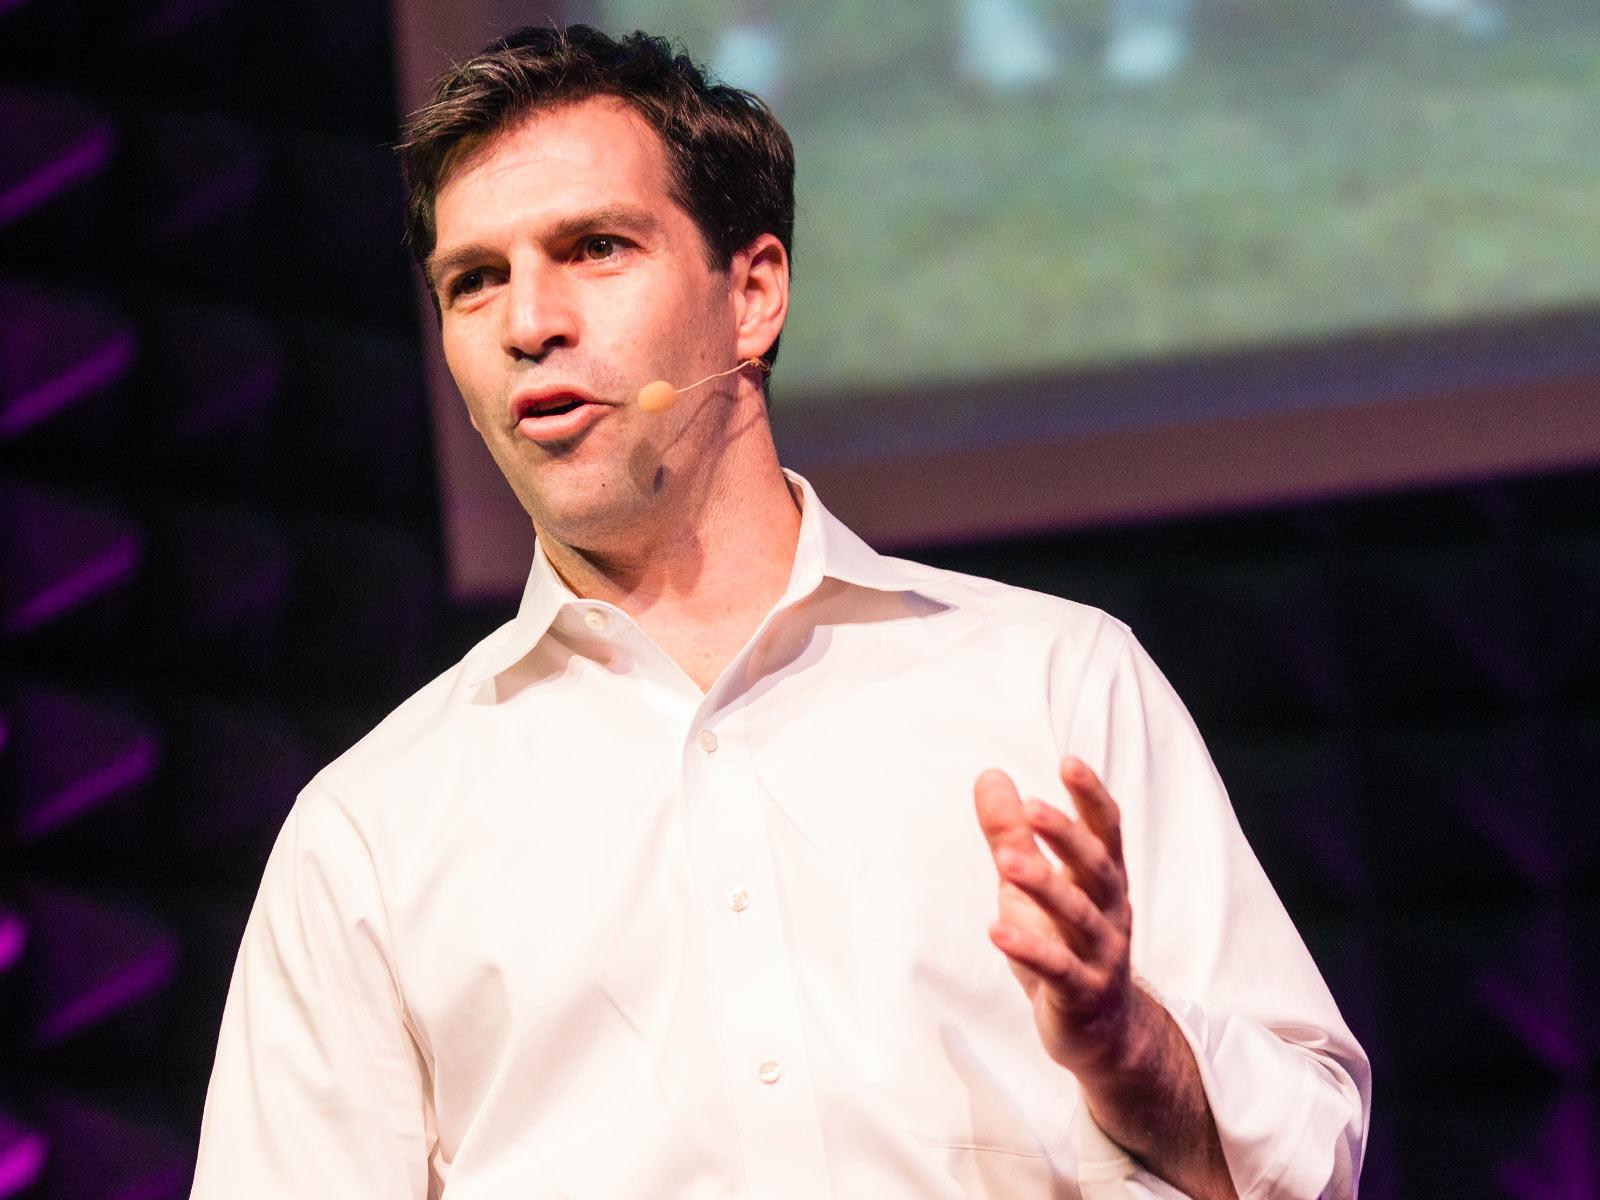 Ted invest in social change bsp forex converter oanda